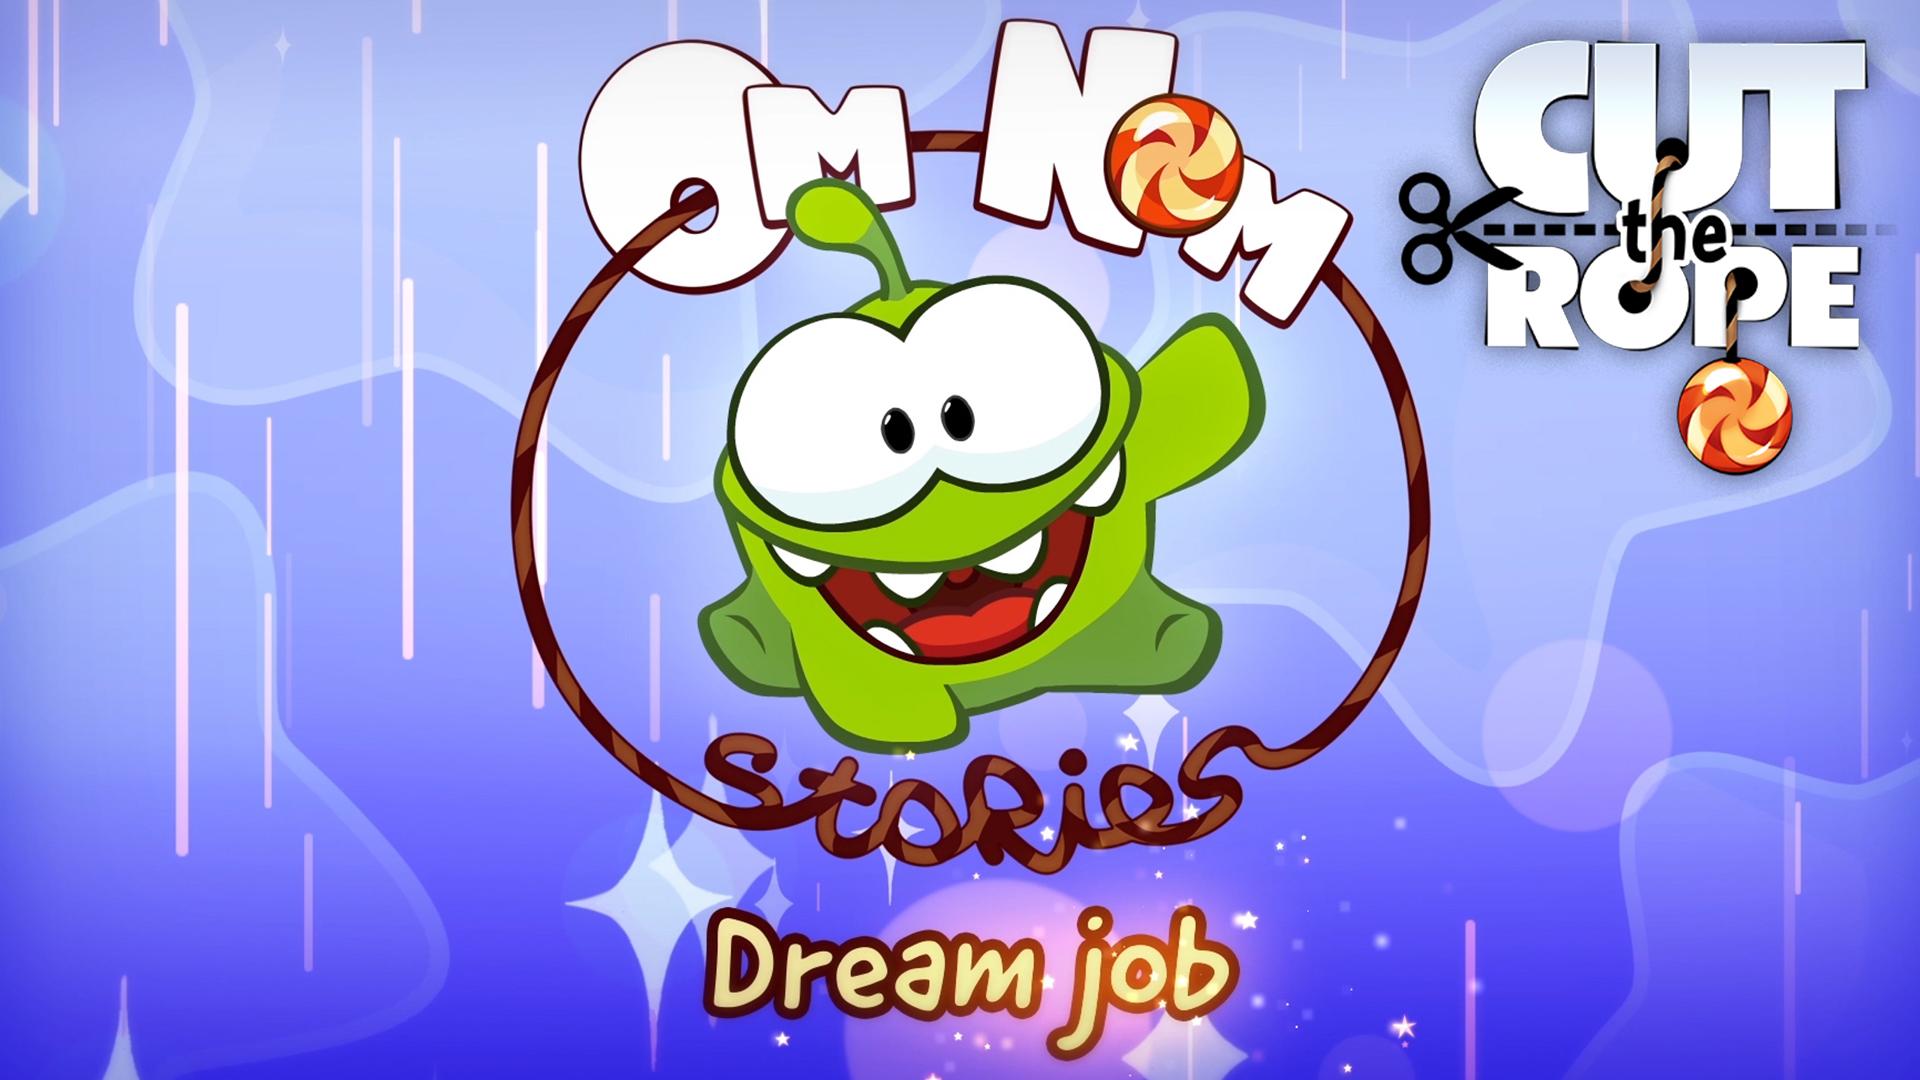 Cut the Rope - Om Nom Stories Dream Job